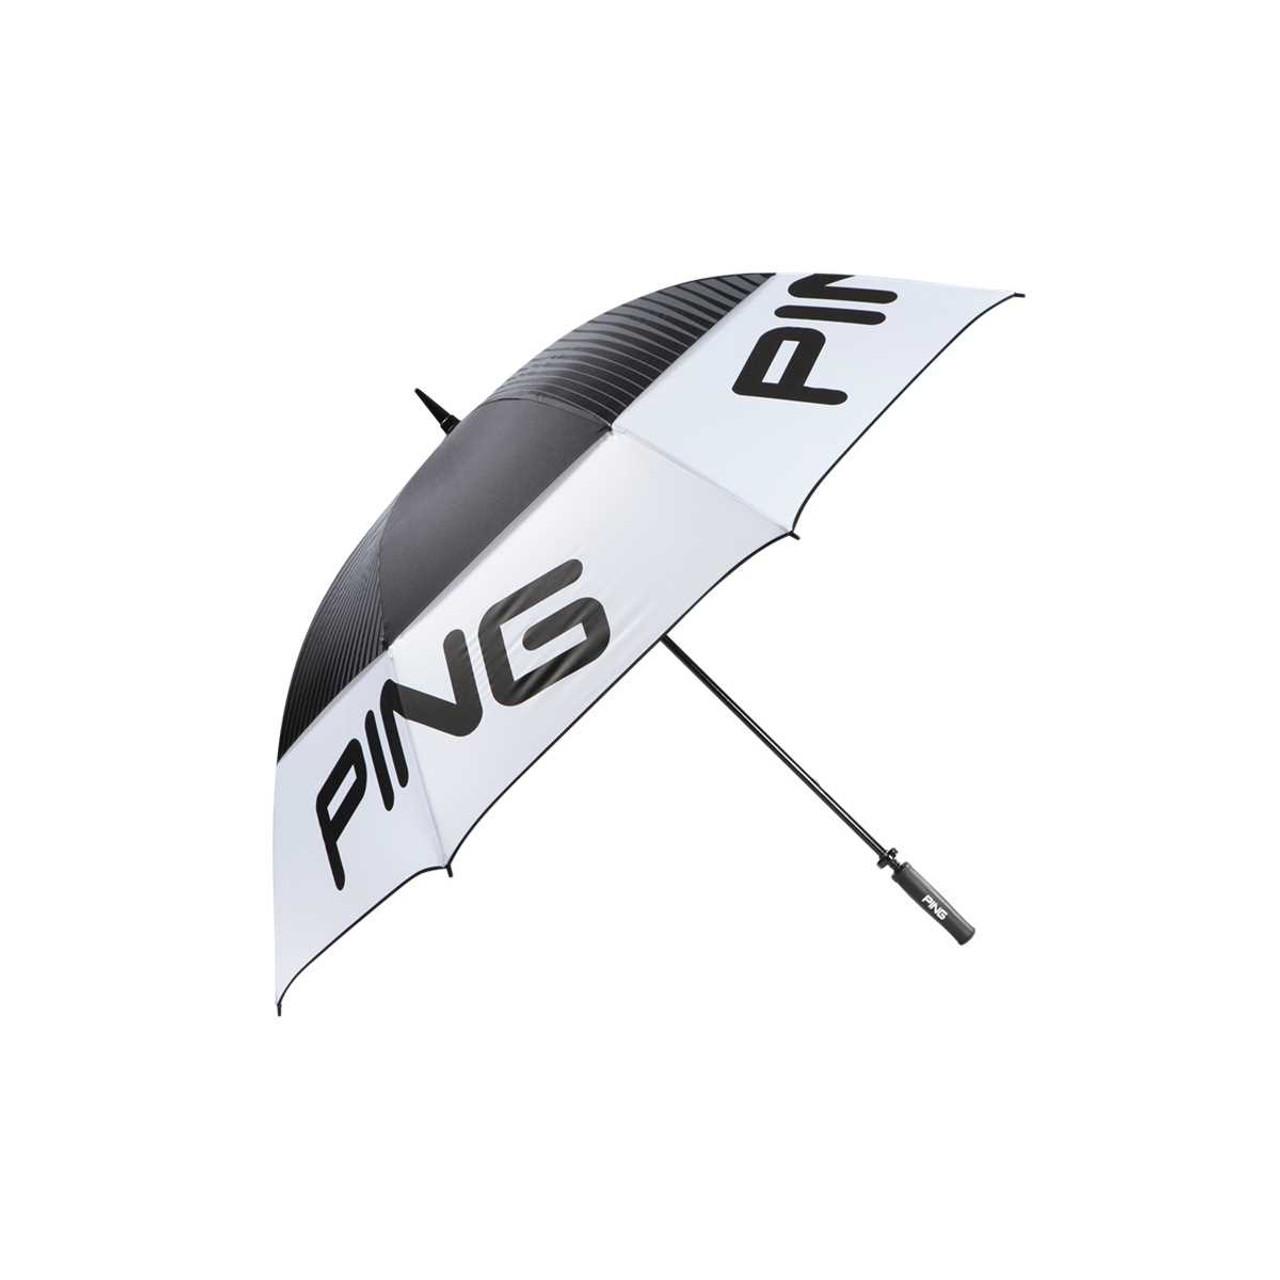 Ping 68 Quot Tour Golf Umbrella White Black Grey Golfland